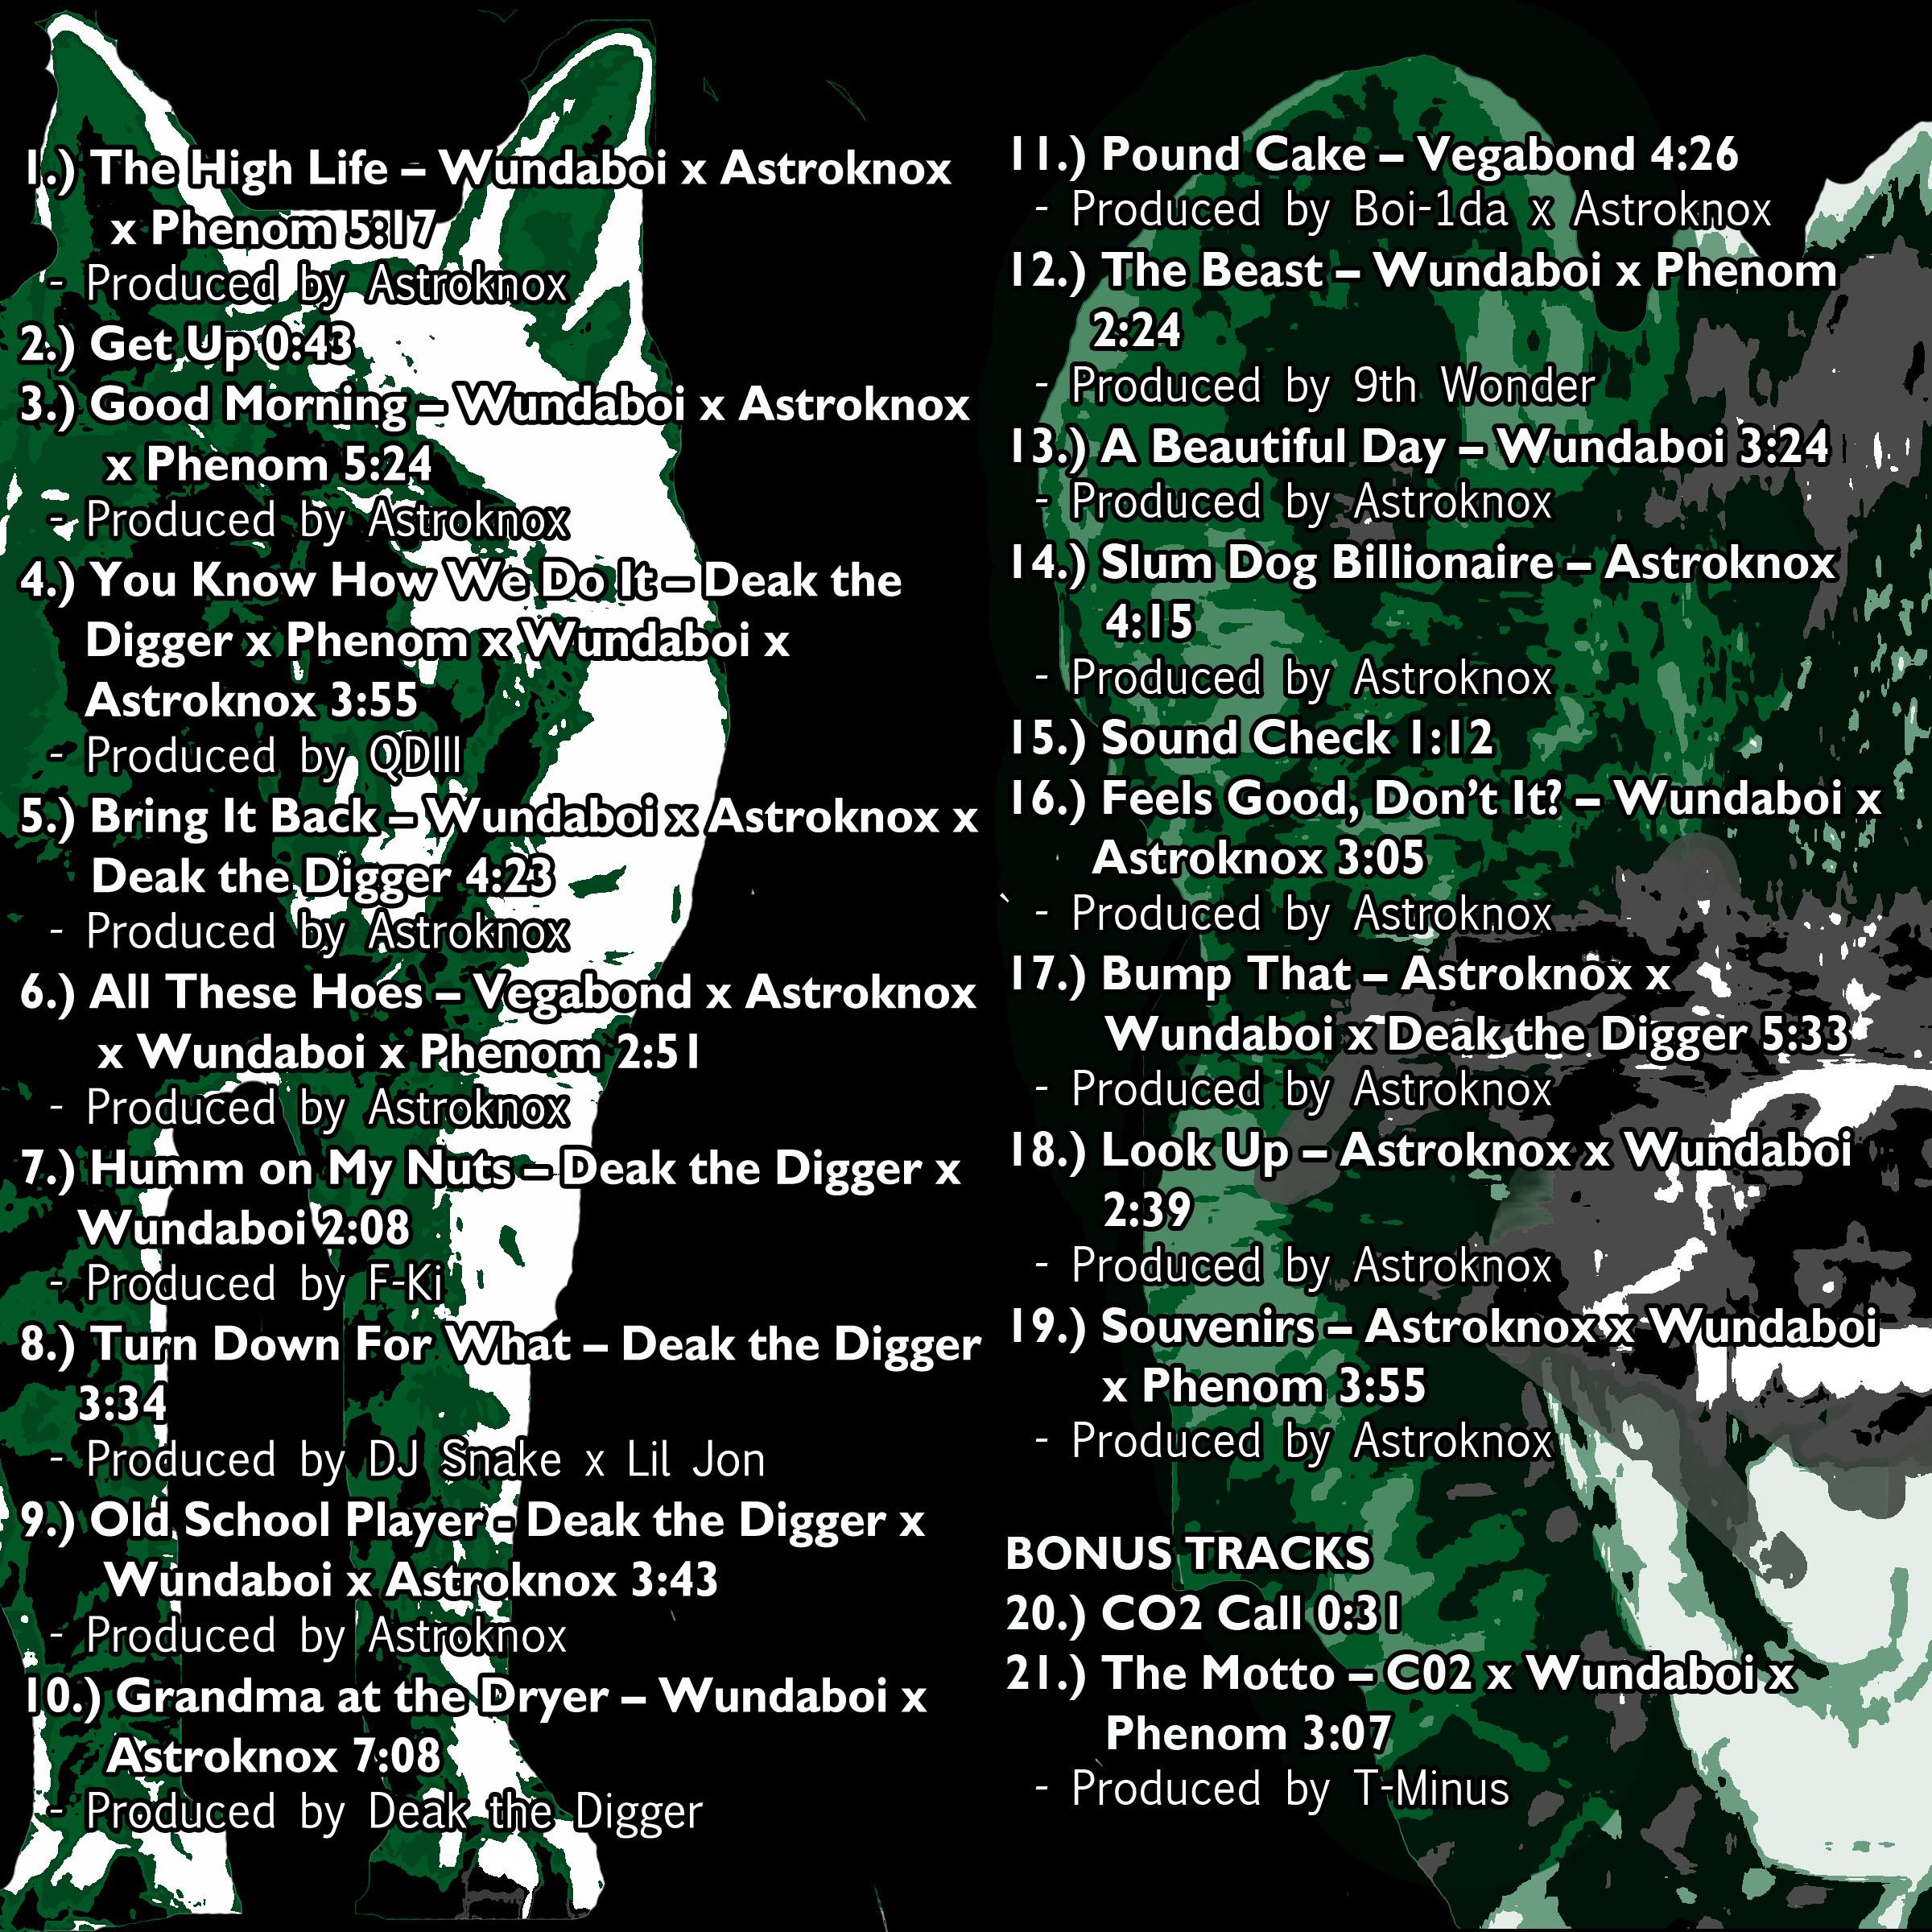 The High Life Tracklist